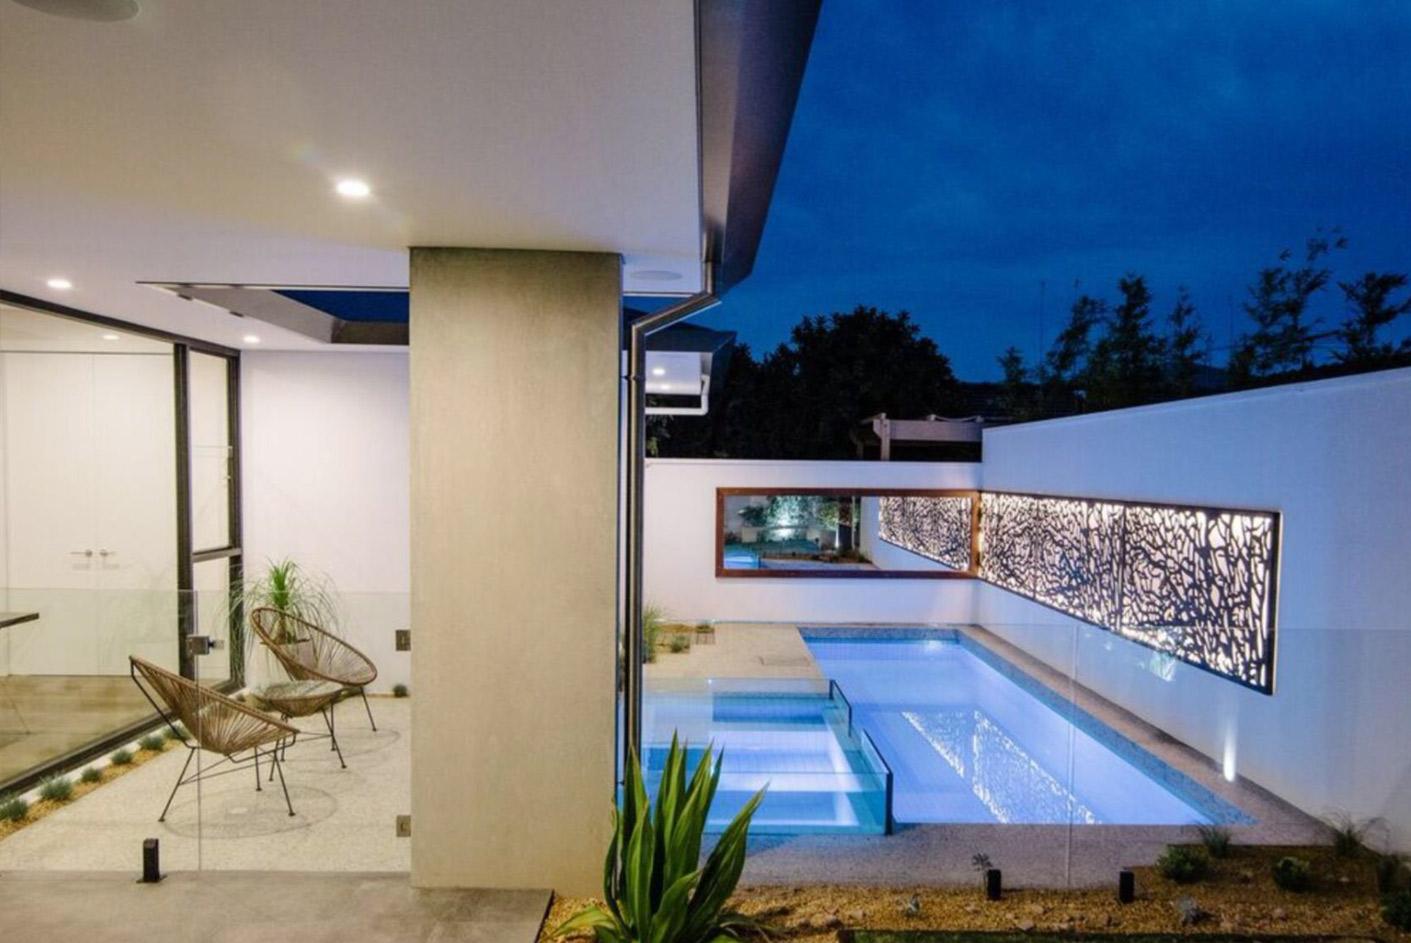 2016 Silver Pool Construction Award